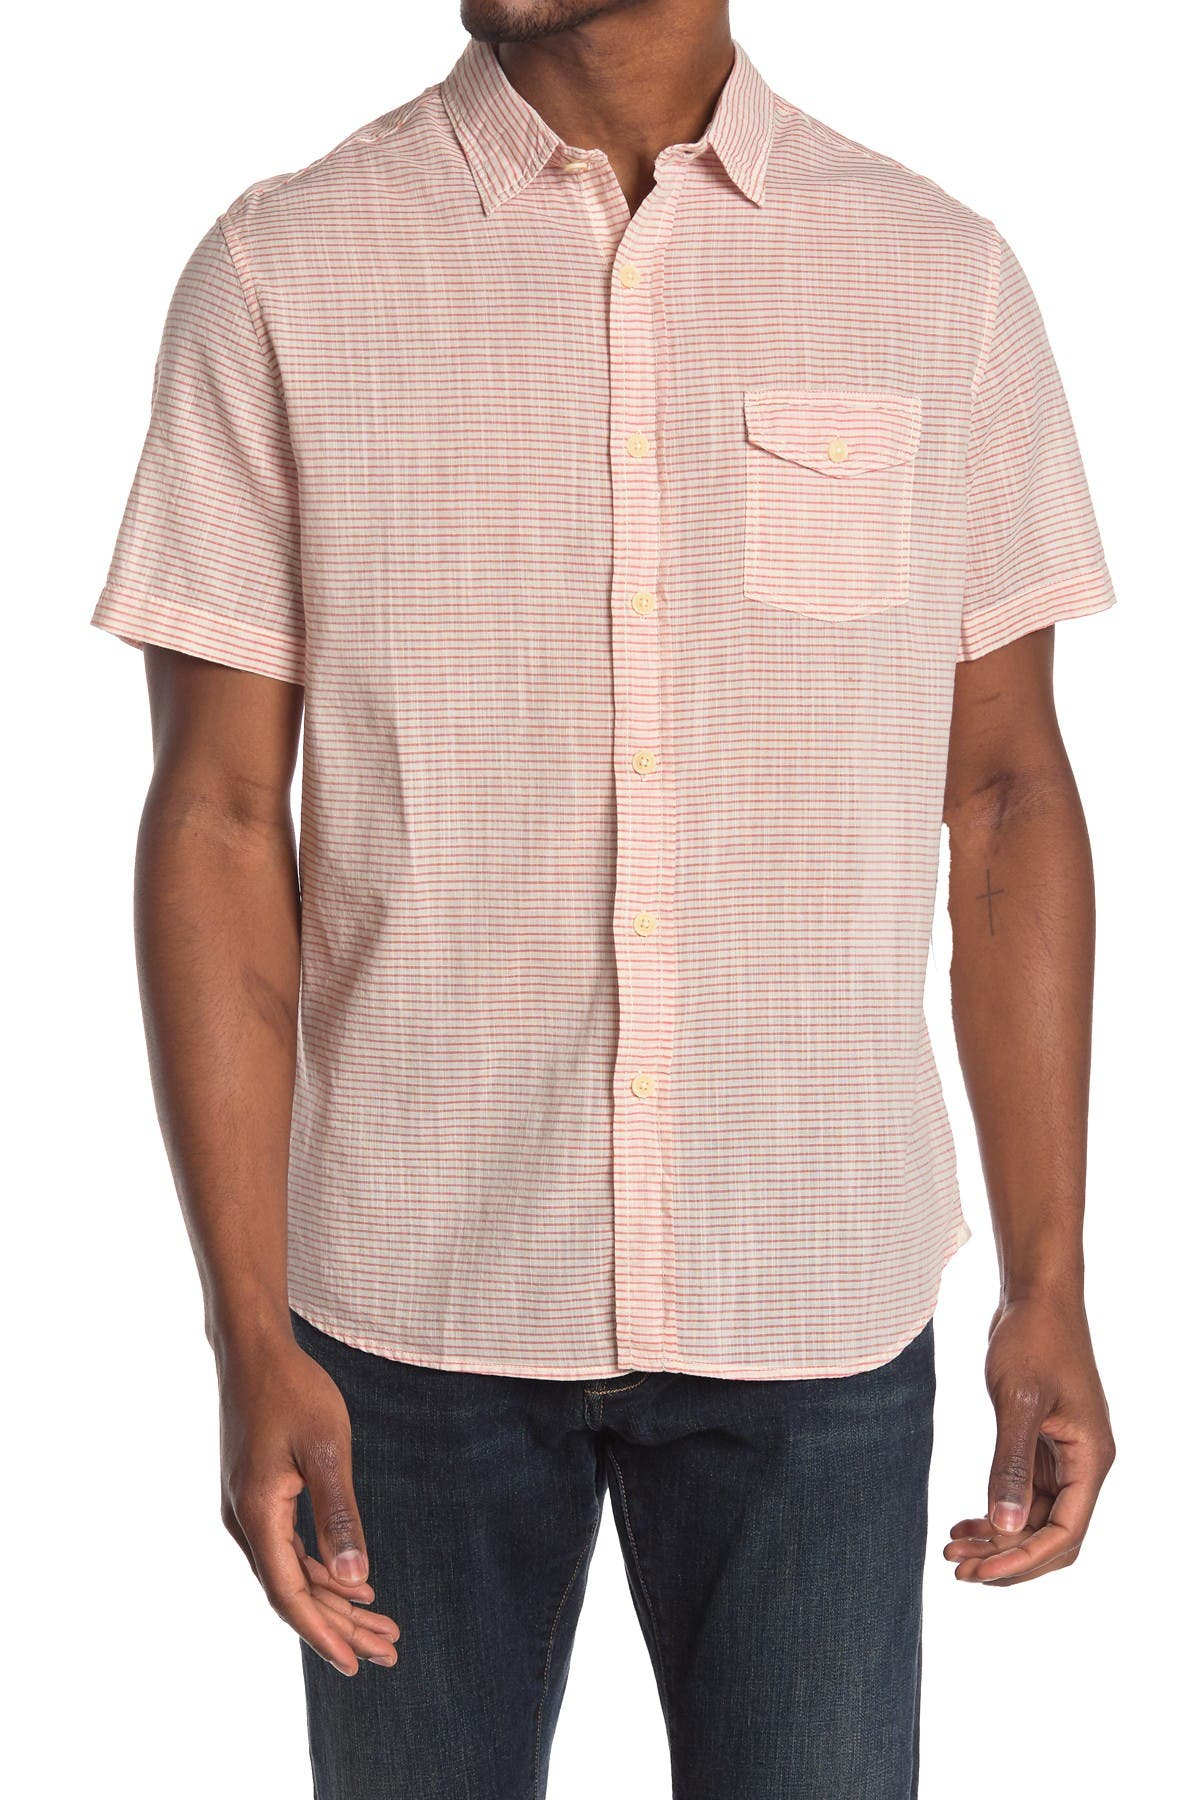 Image of Grayers Fairfield Horizontal Stripe Trim Fit Shirt